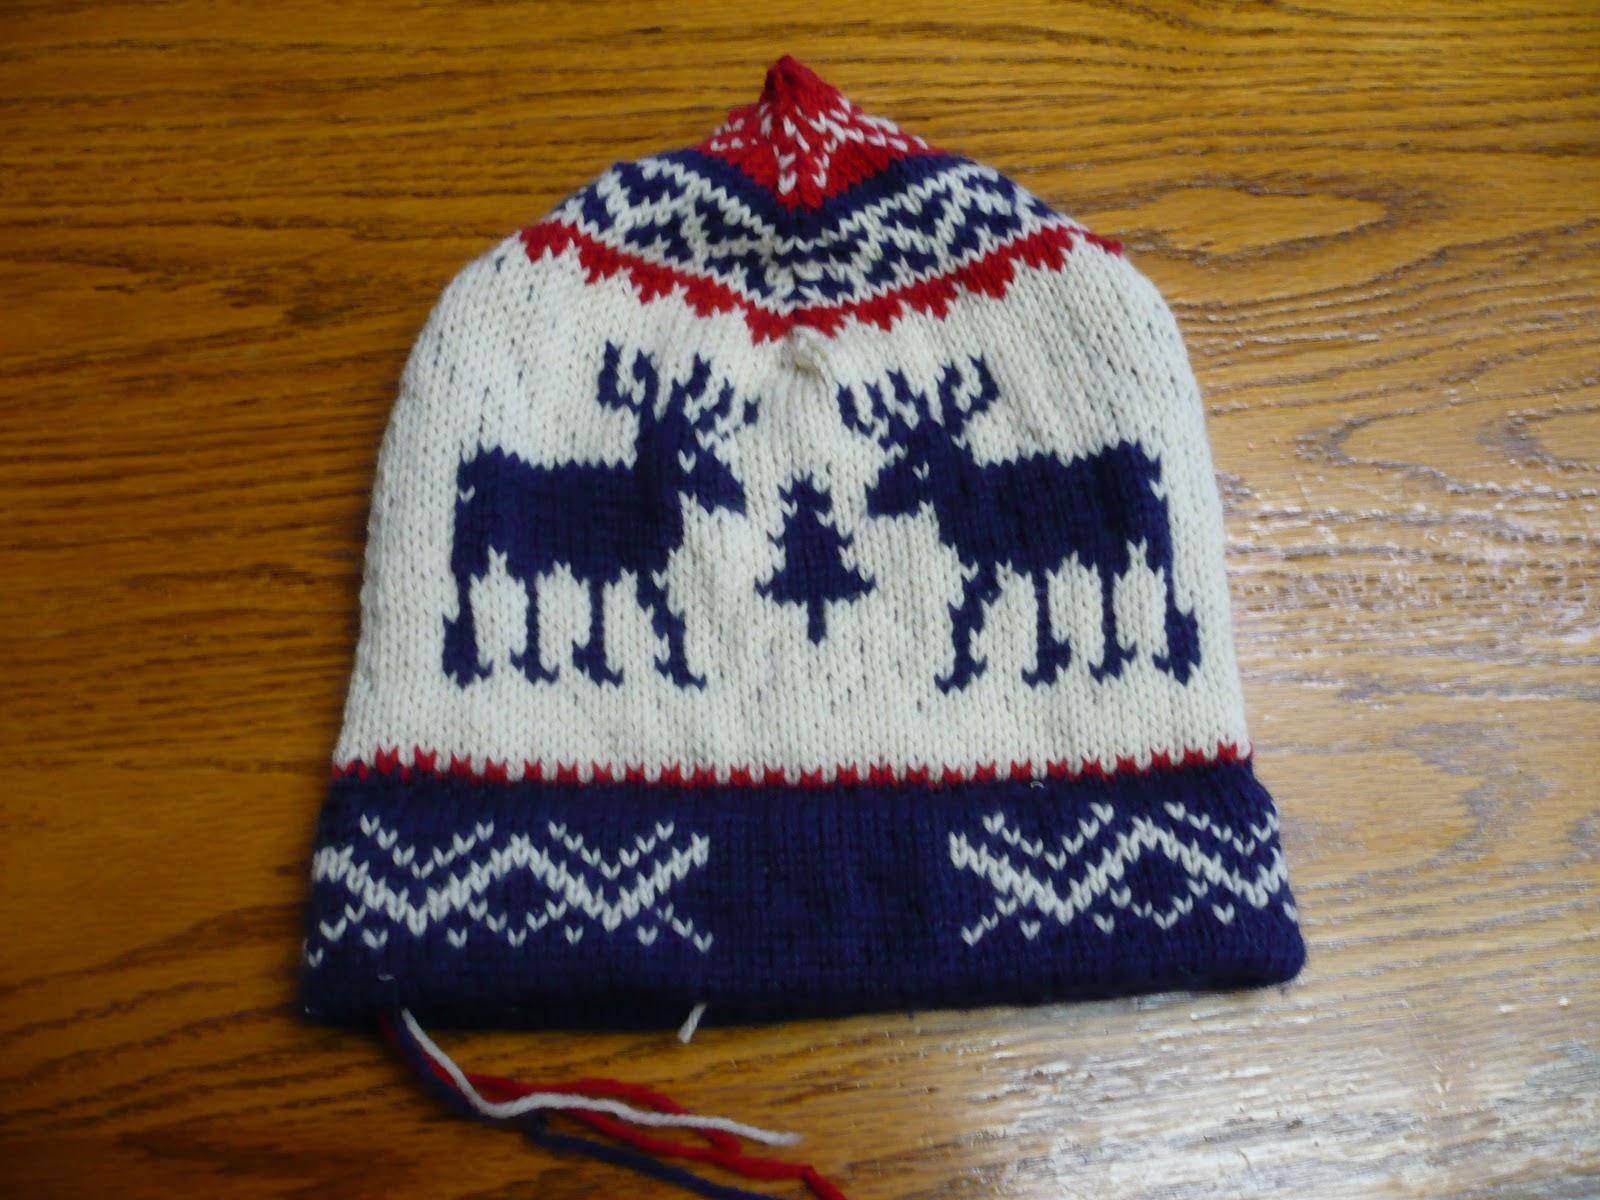 722273969973 DianeLoves2Quilt: Winter 2010 Olympics Reindeer Hat